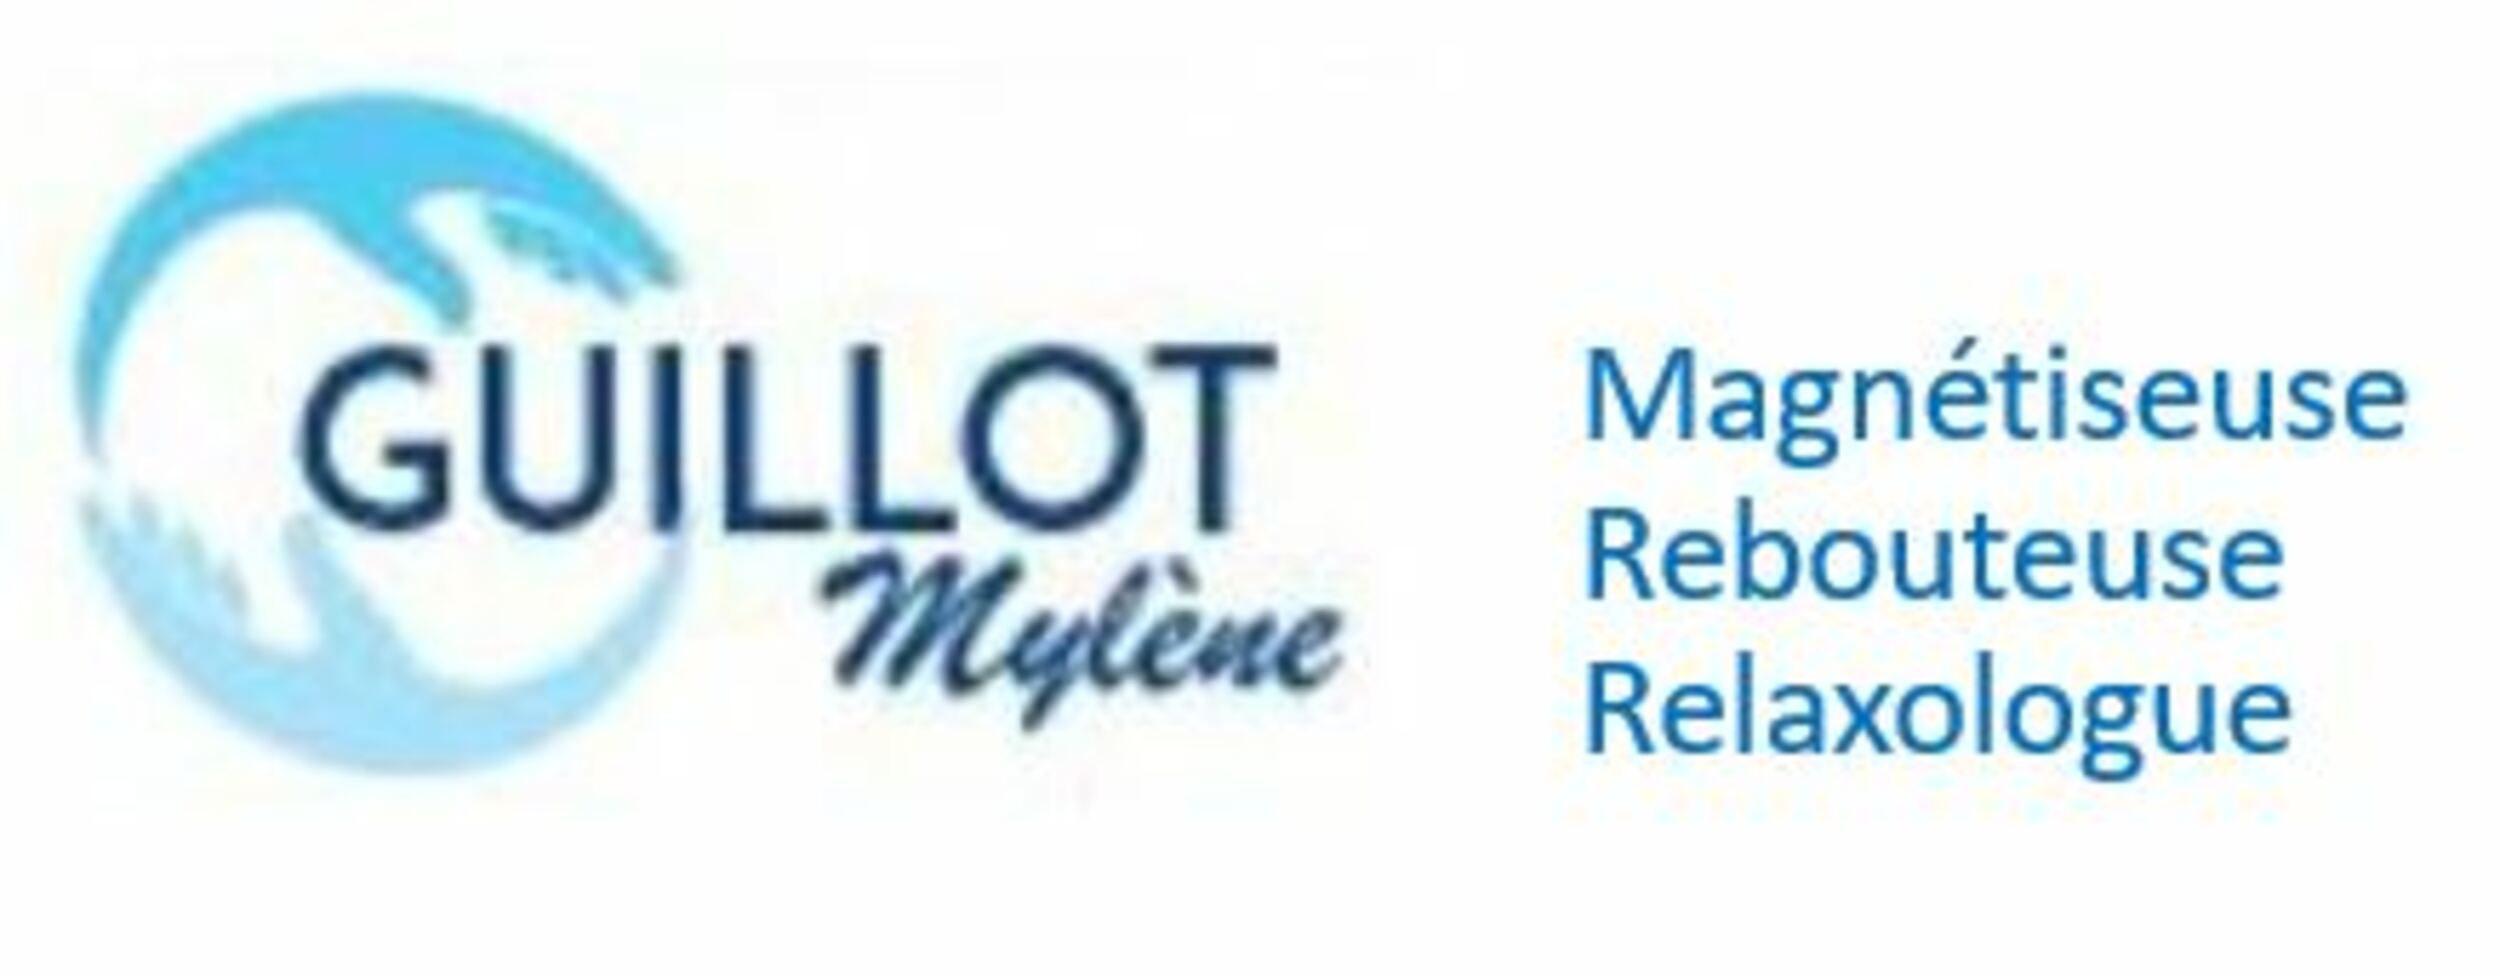 Mylène GUILLOT – Magnétiseuse Rebouteuse Relaxologue